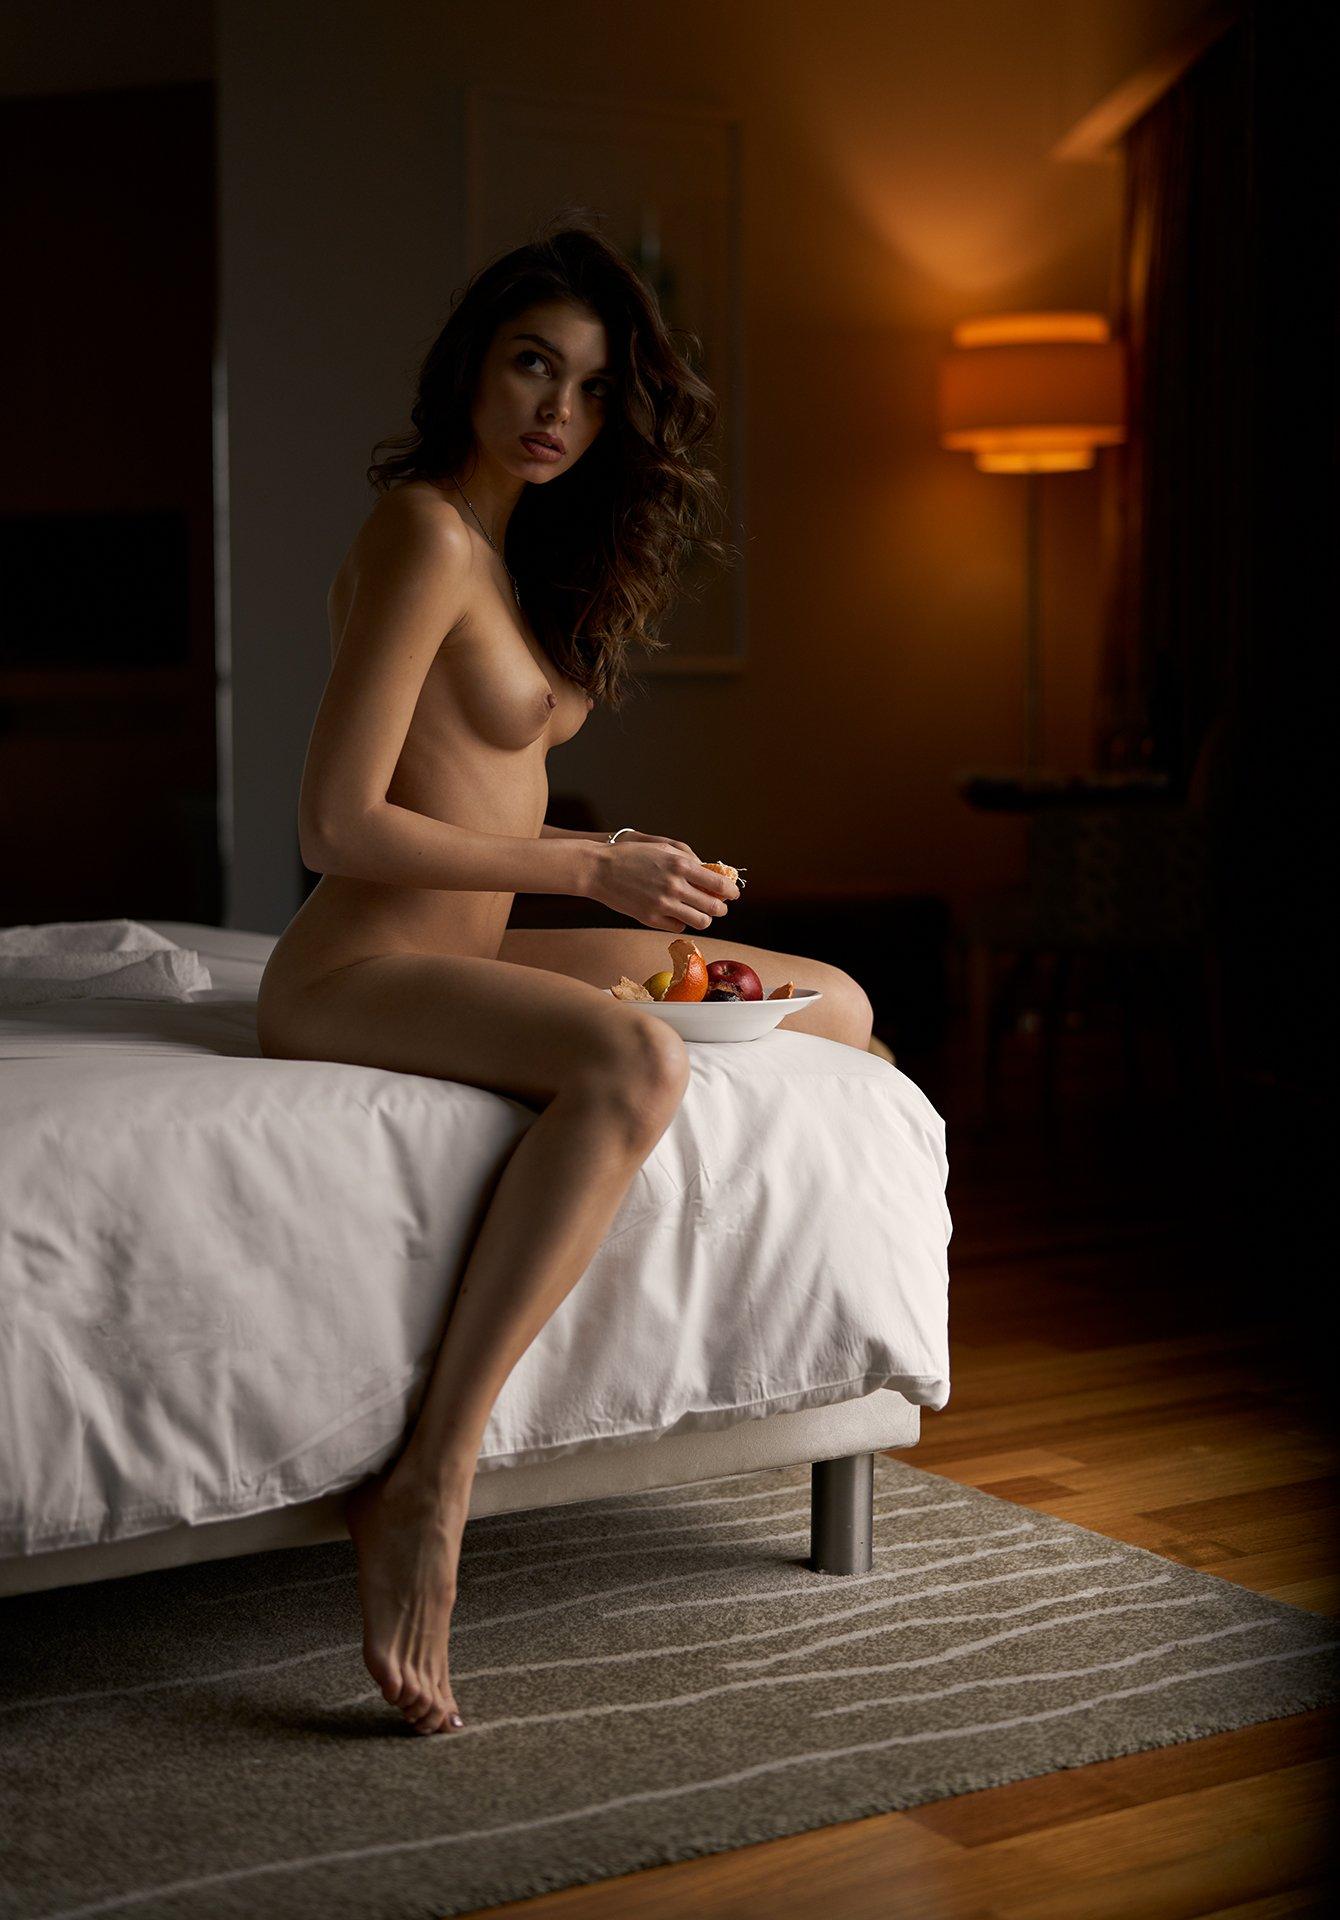 nude, naked, hotel, fruits, natural light, beautiful, nice, sexy, beauty,, Роман Филиппов